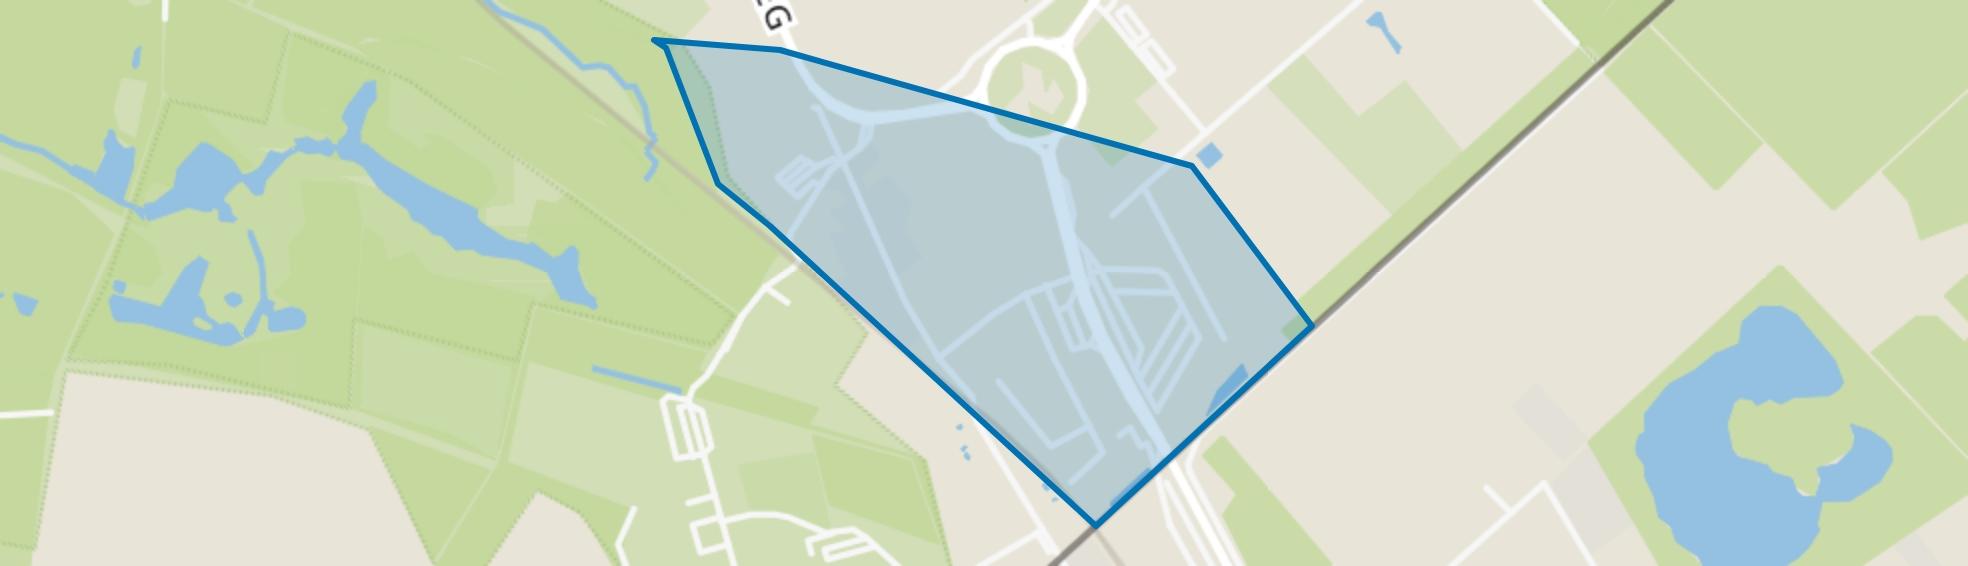 Keulse Barriére, Venlo map